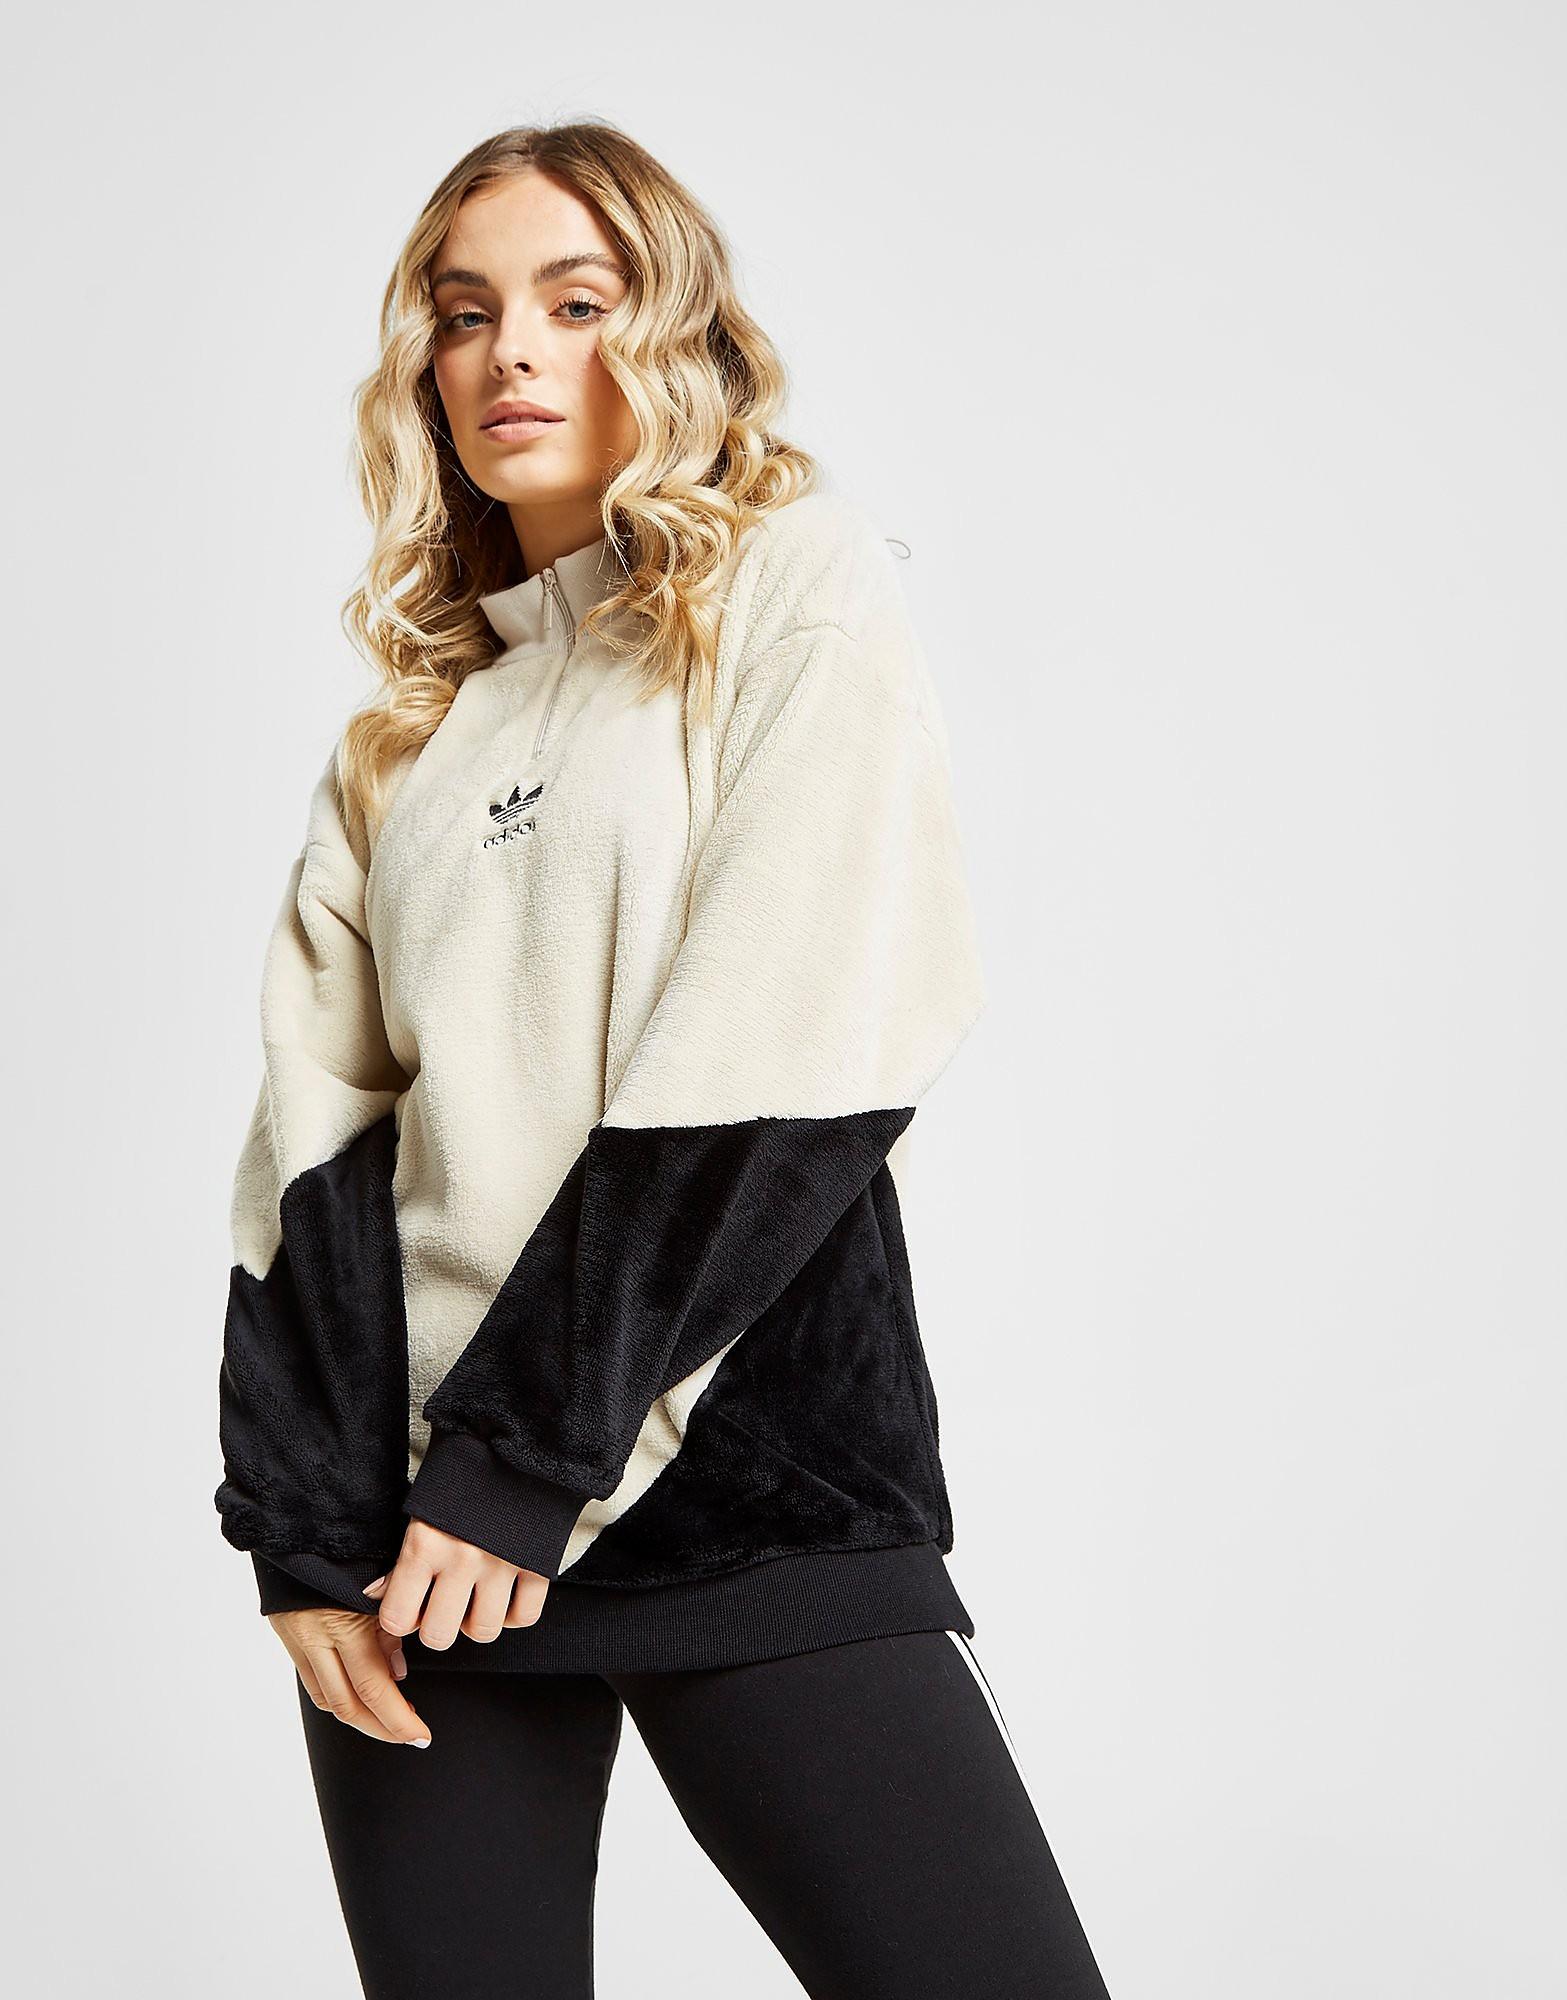 adidas Originals Polar Fleece 1/4 Zip Track Top Dames - Bruin - Dames